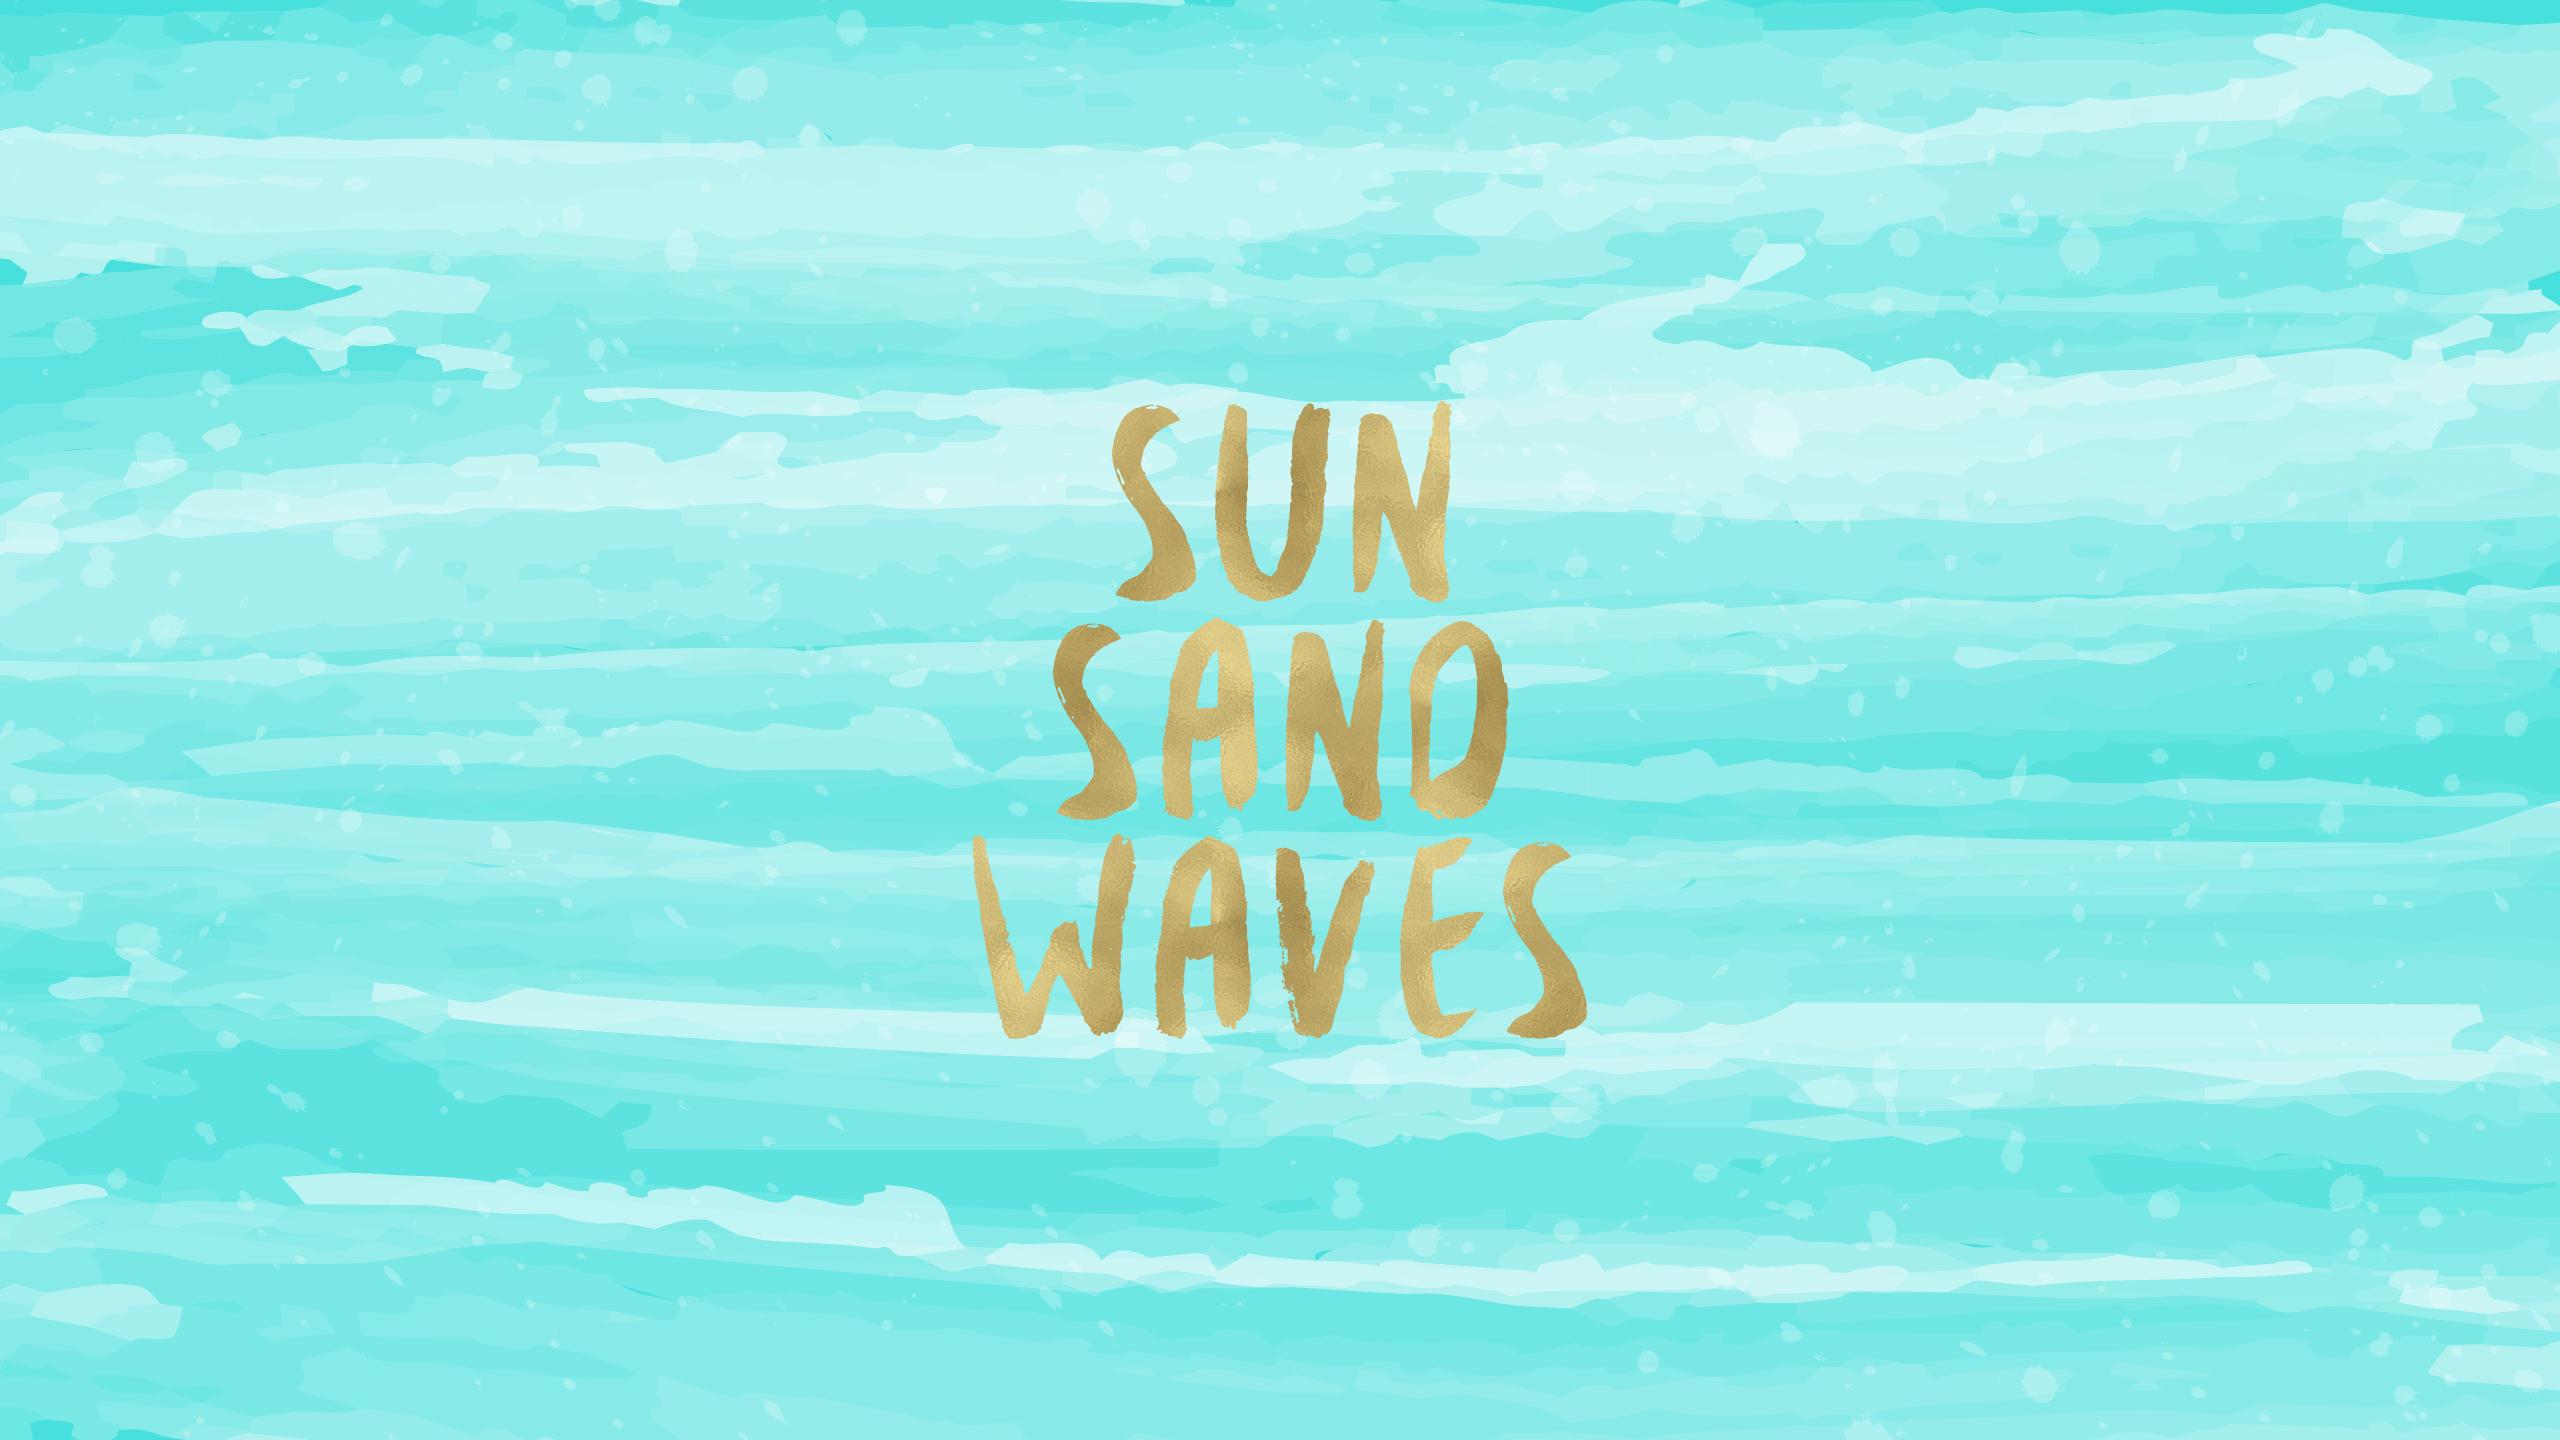 Sun Sand Waves Desktop Wallpaper Wallpapers and Backgrounds 2560x1440